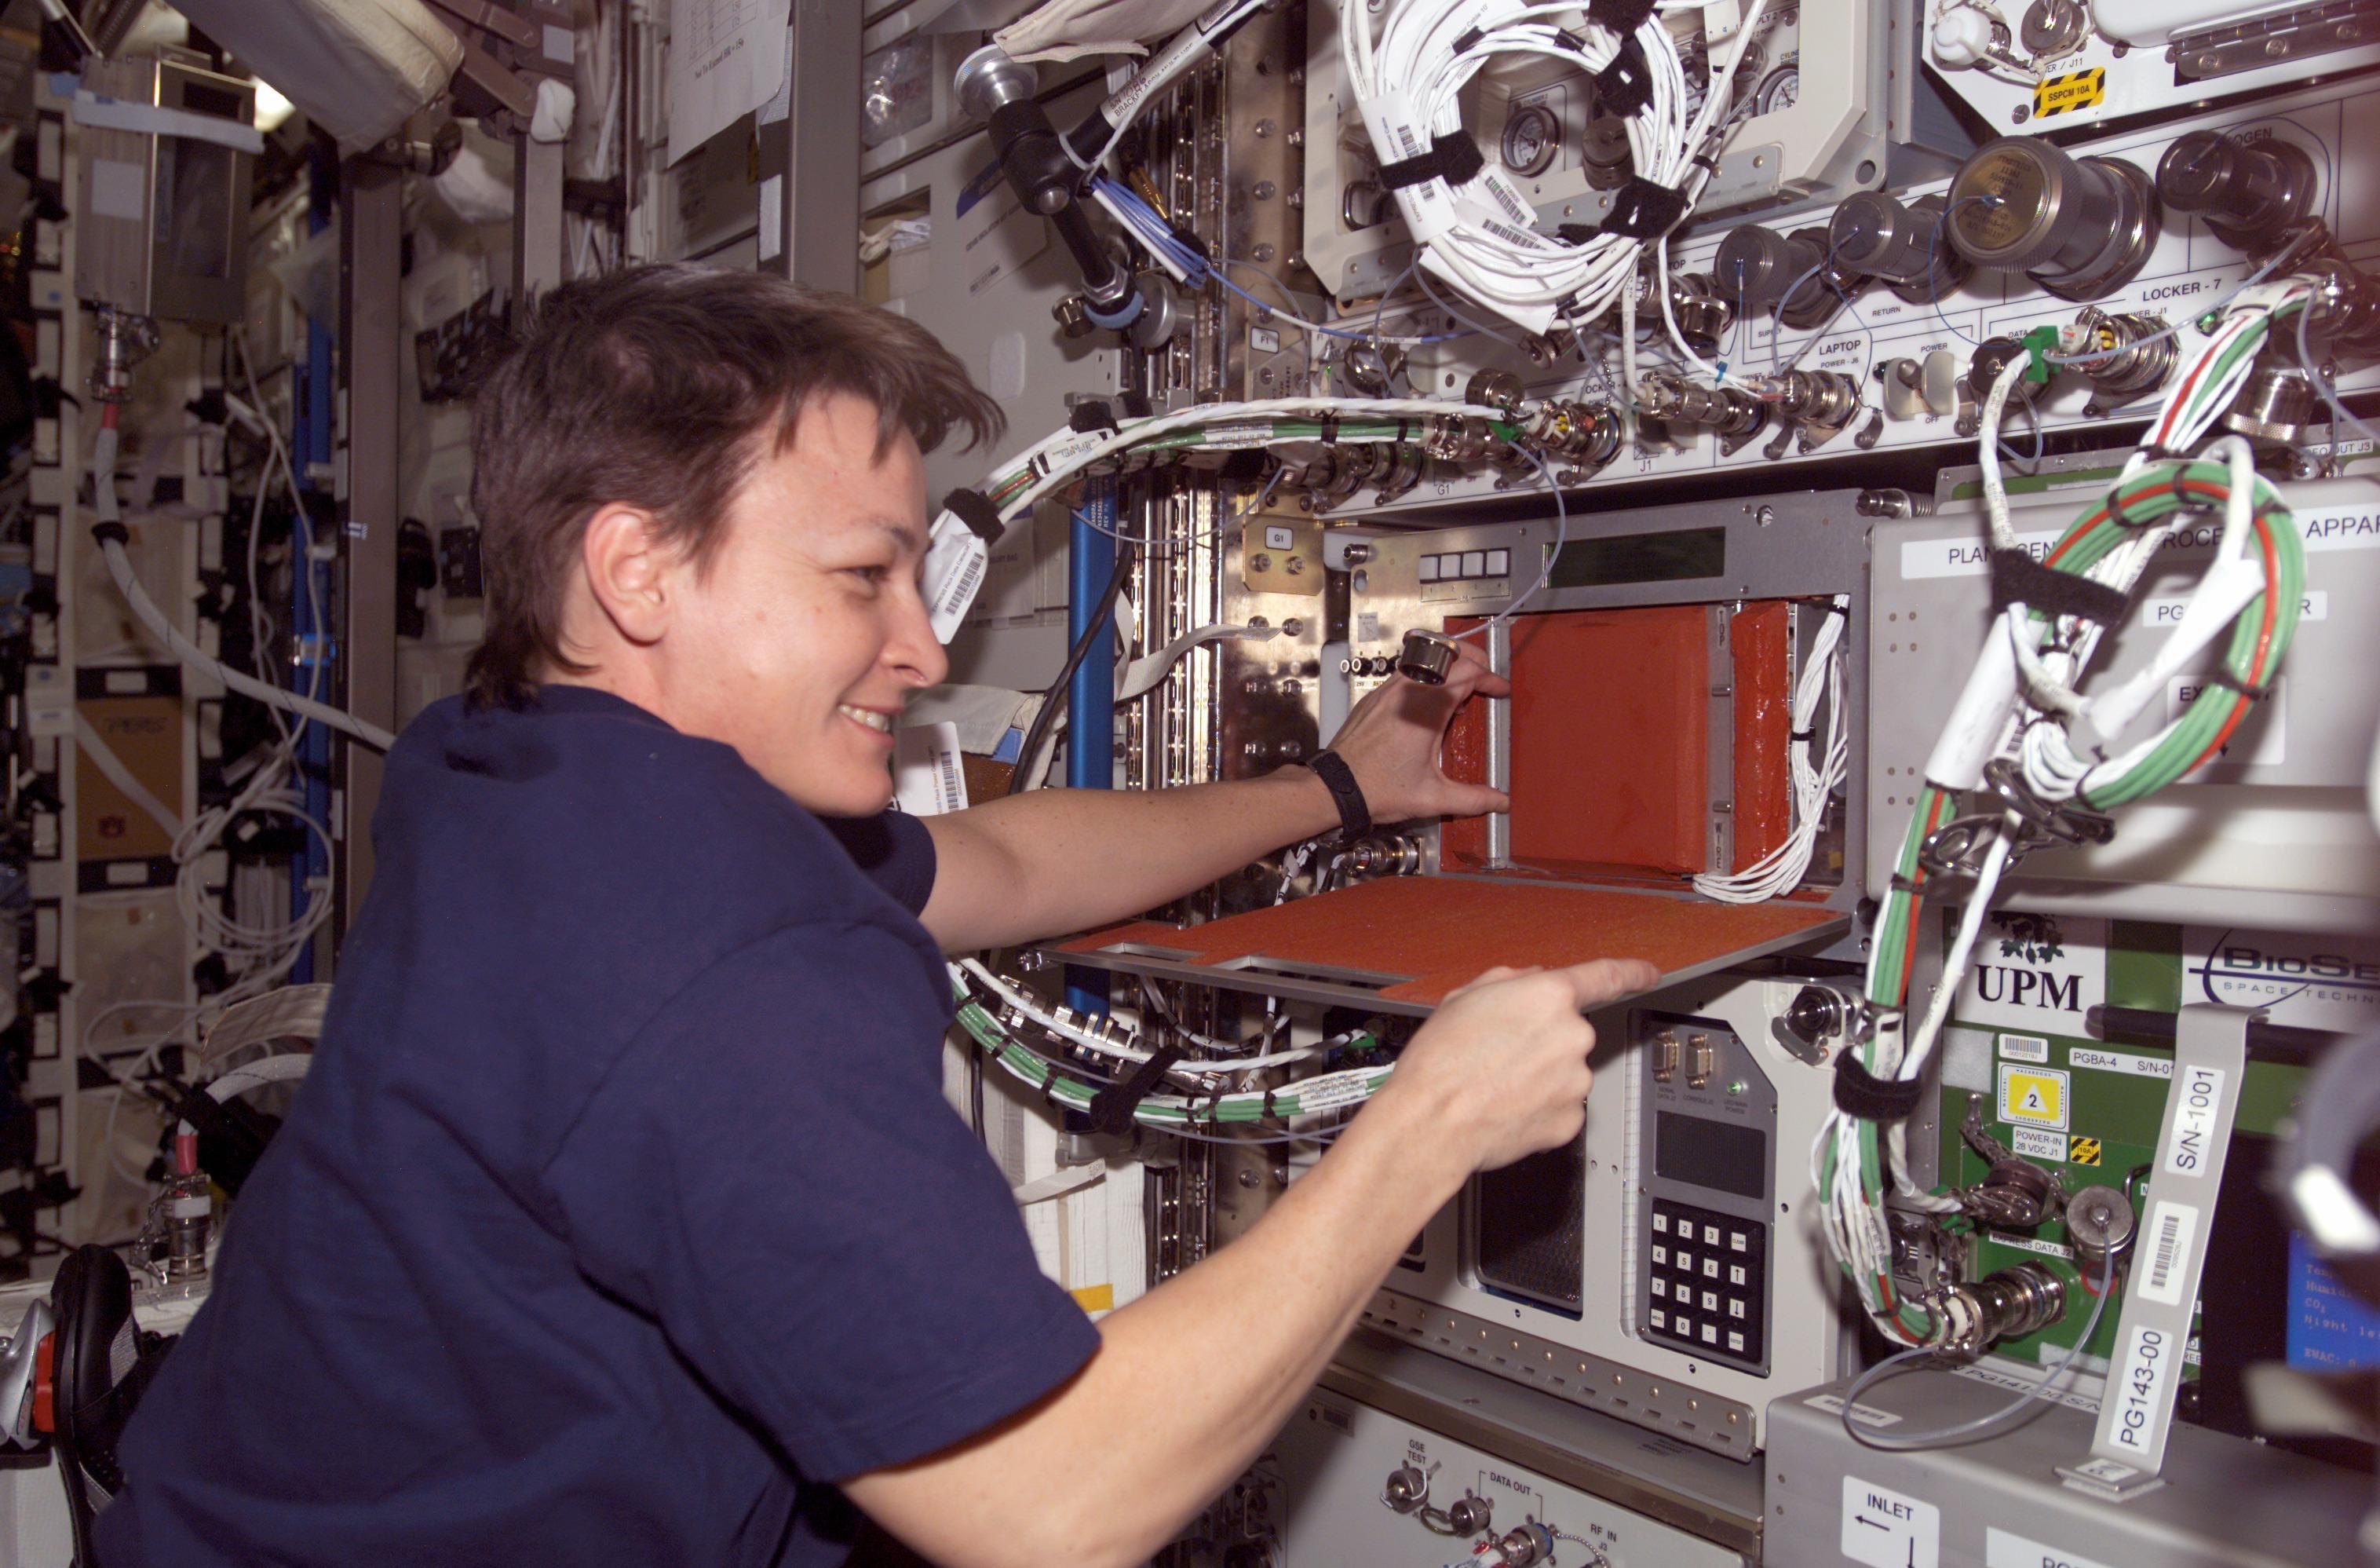 astronaut space radiation - photo #20